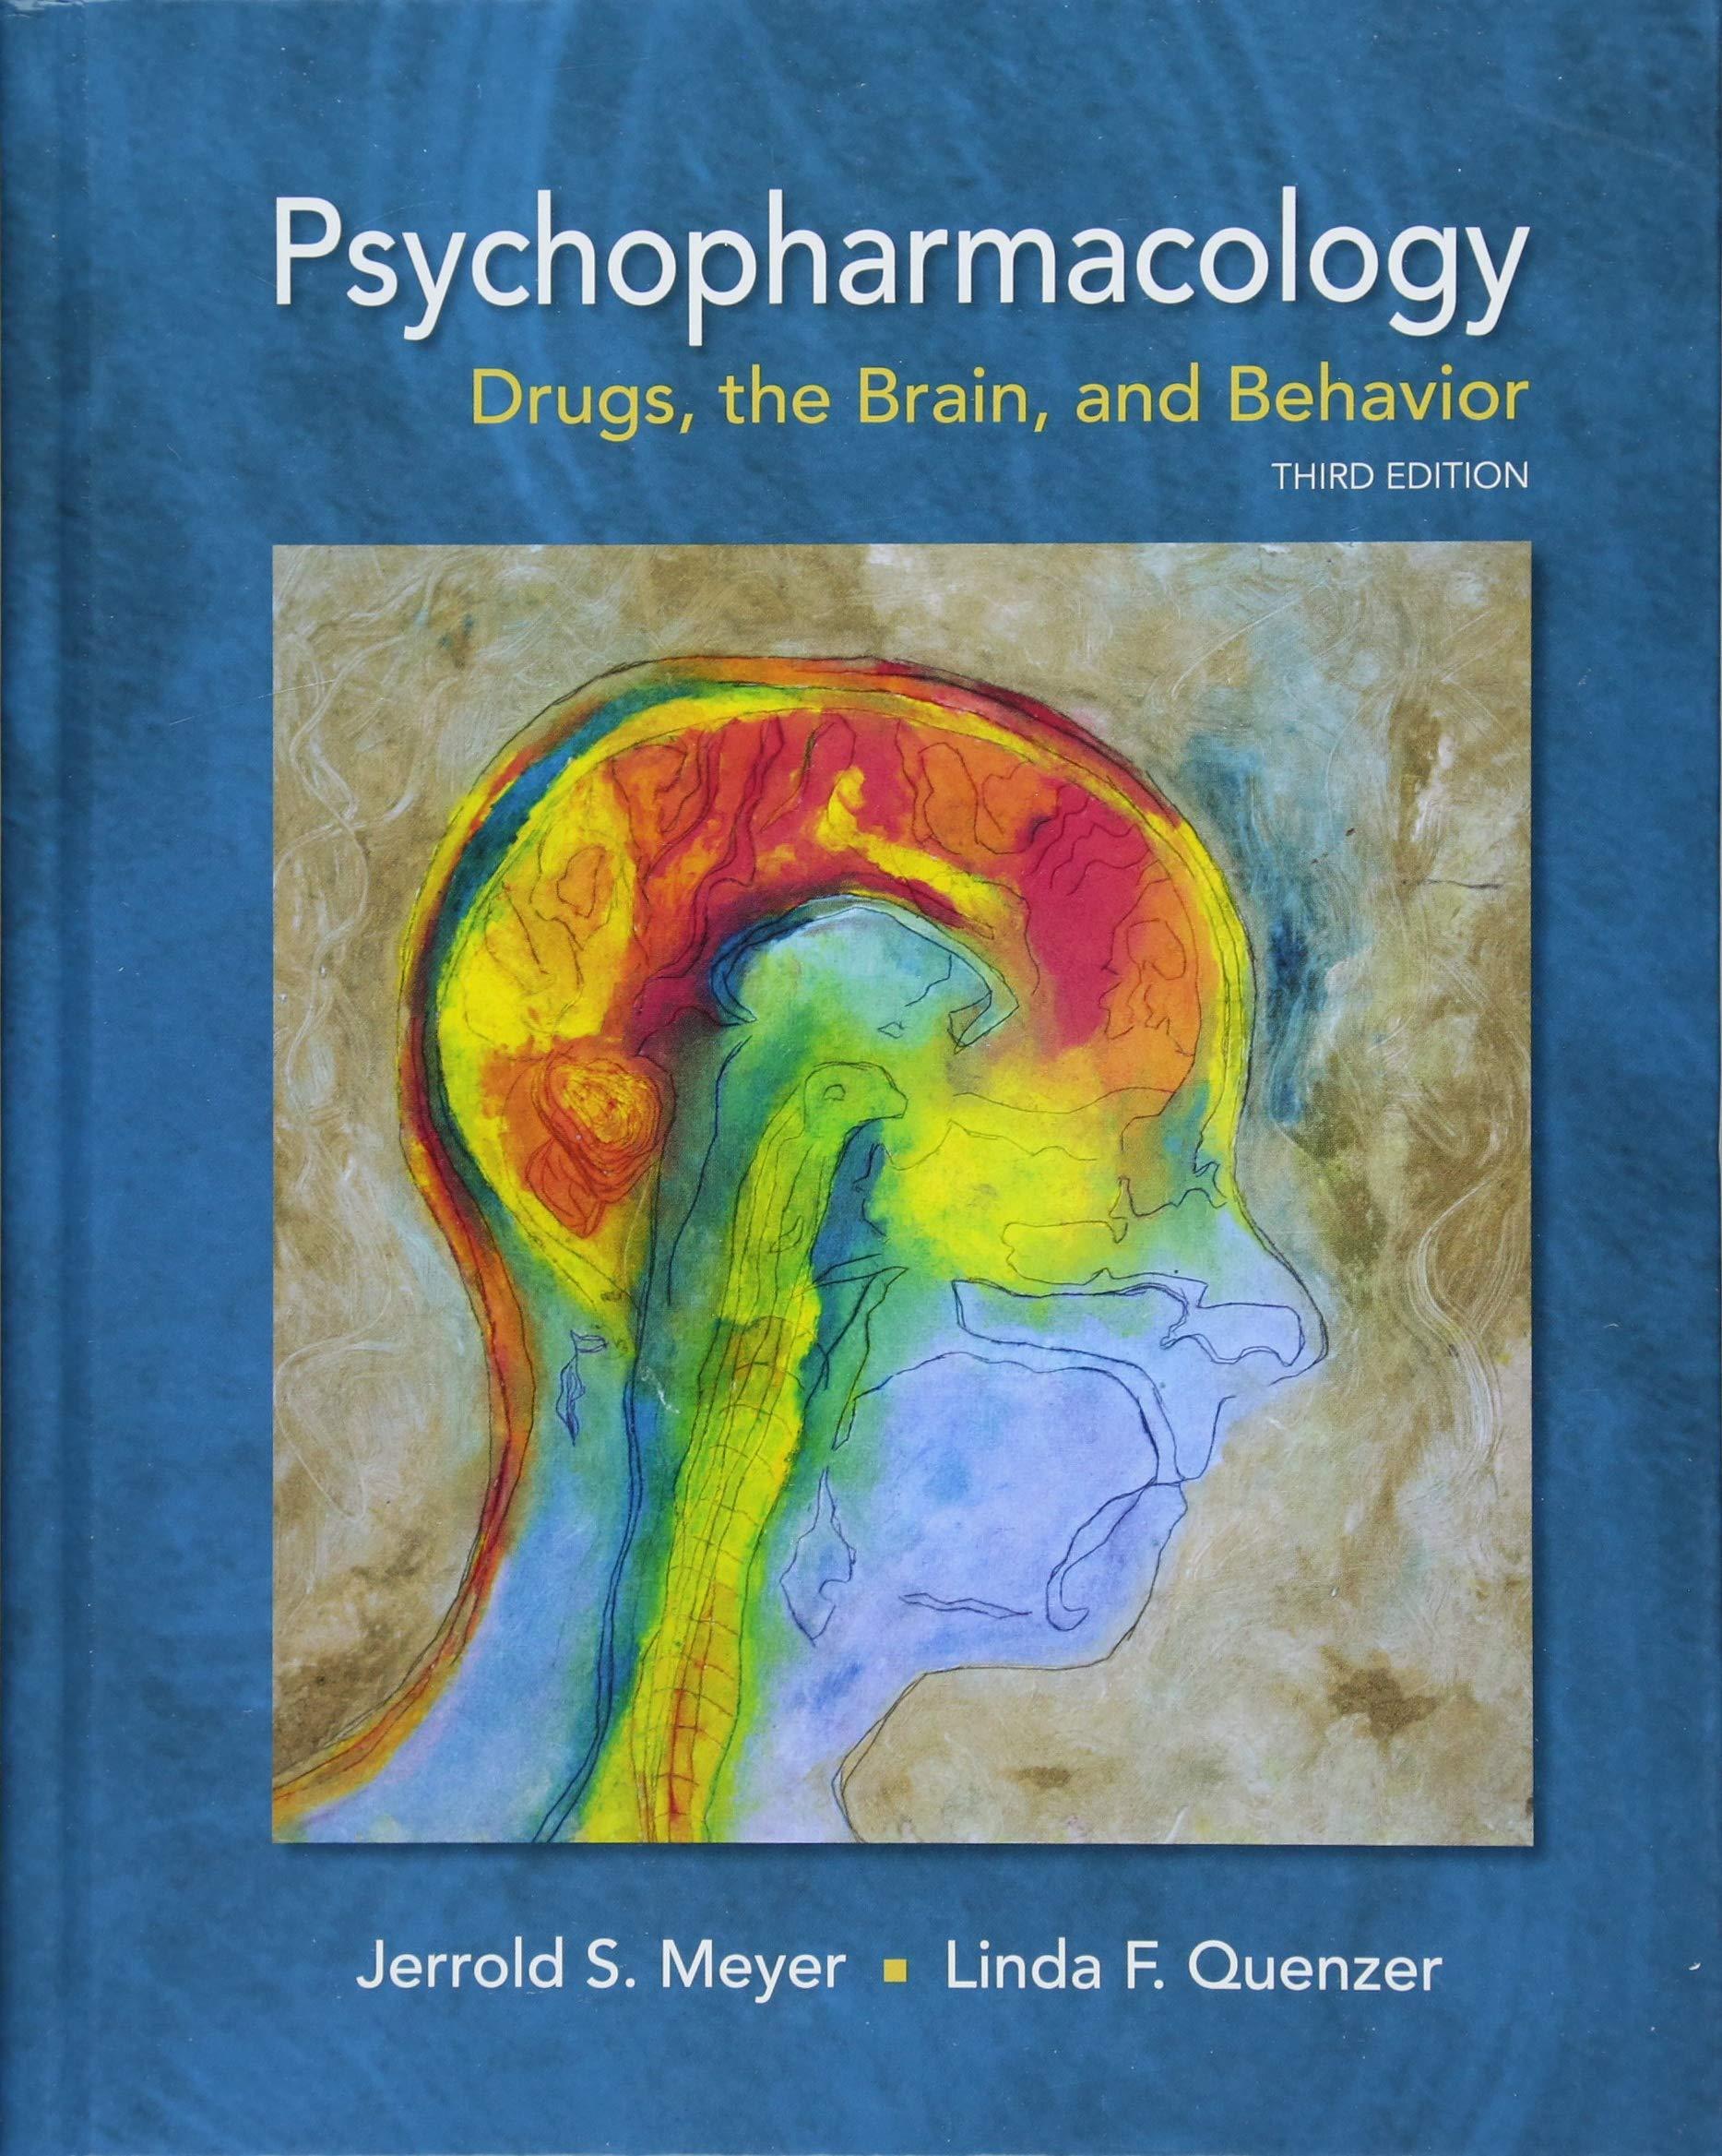 Psychopharmacology: Drugs, the Brain, and Behavior: Jerrold S. Meyer, Linda  F. Quenzer: 9781605355559: Pain Medicine: Amazon Canada